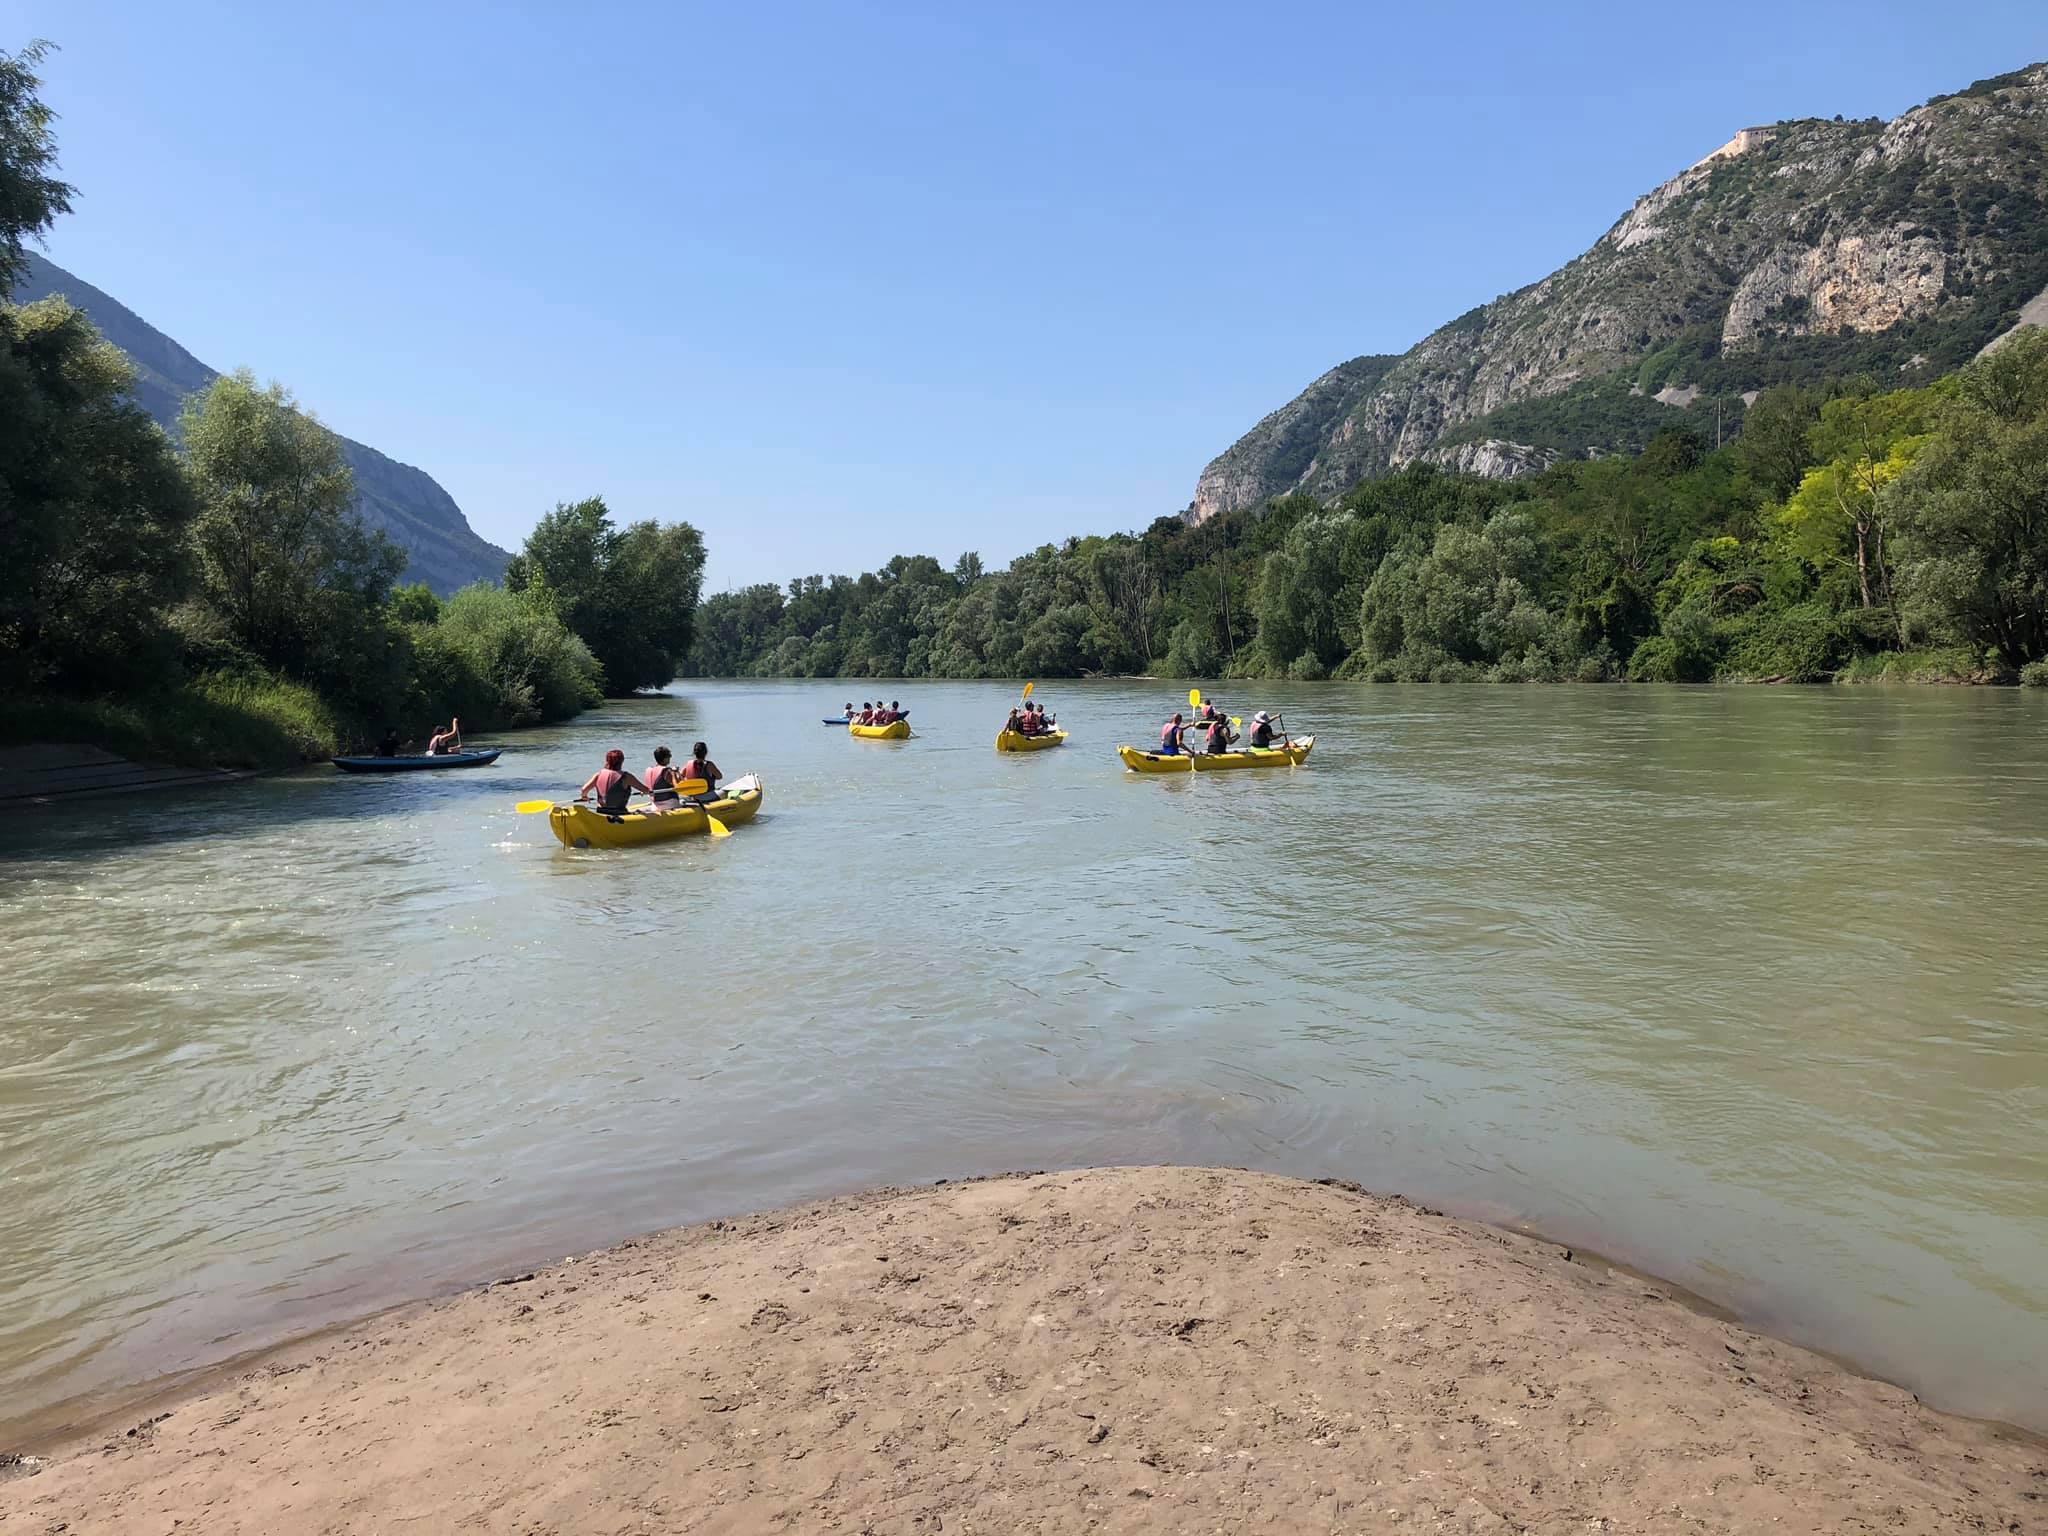 VisitValdadige.com Rafting/ kayak/ ready to gooooo! Tour nel fiume Adige! #raf...